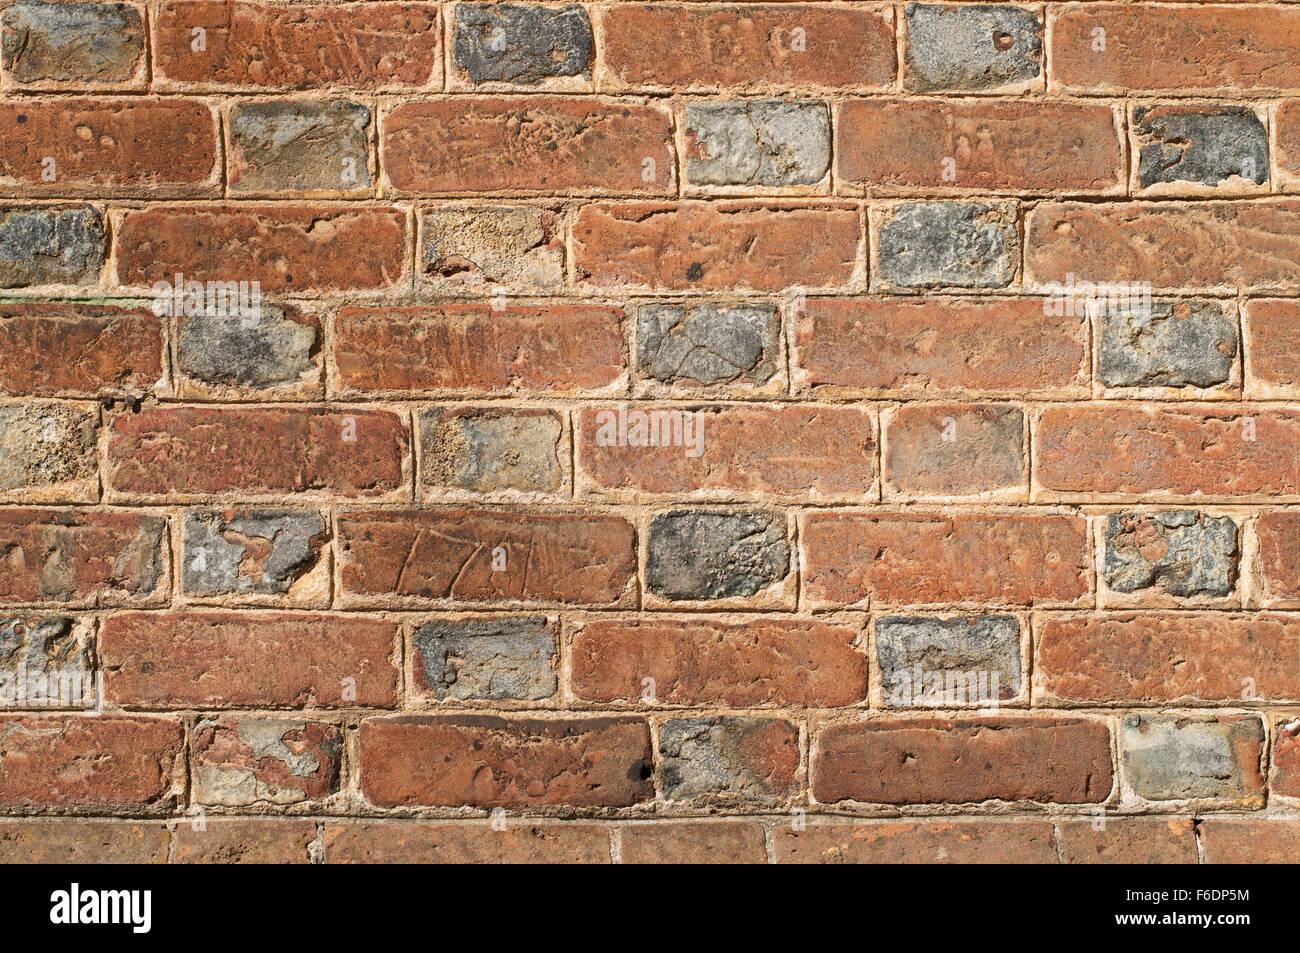 Flemish Bond brickwork seen in a wall at Colonial Williamsburg, Virginia, USA - Stock Image